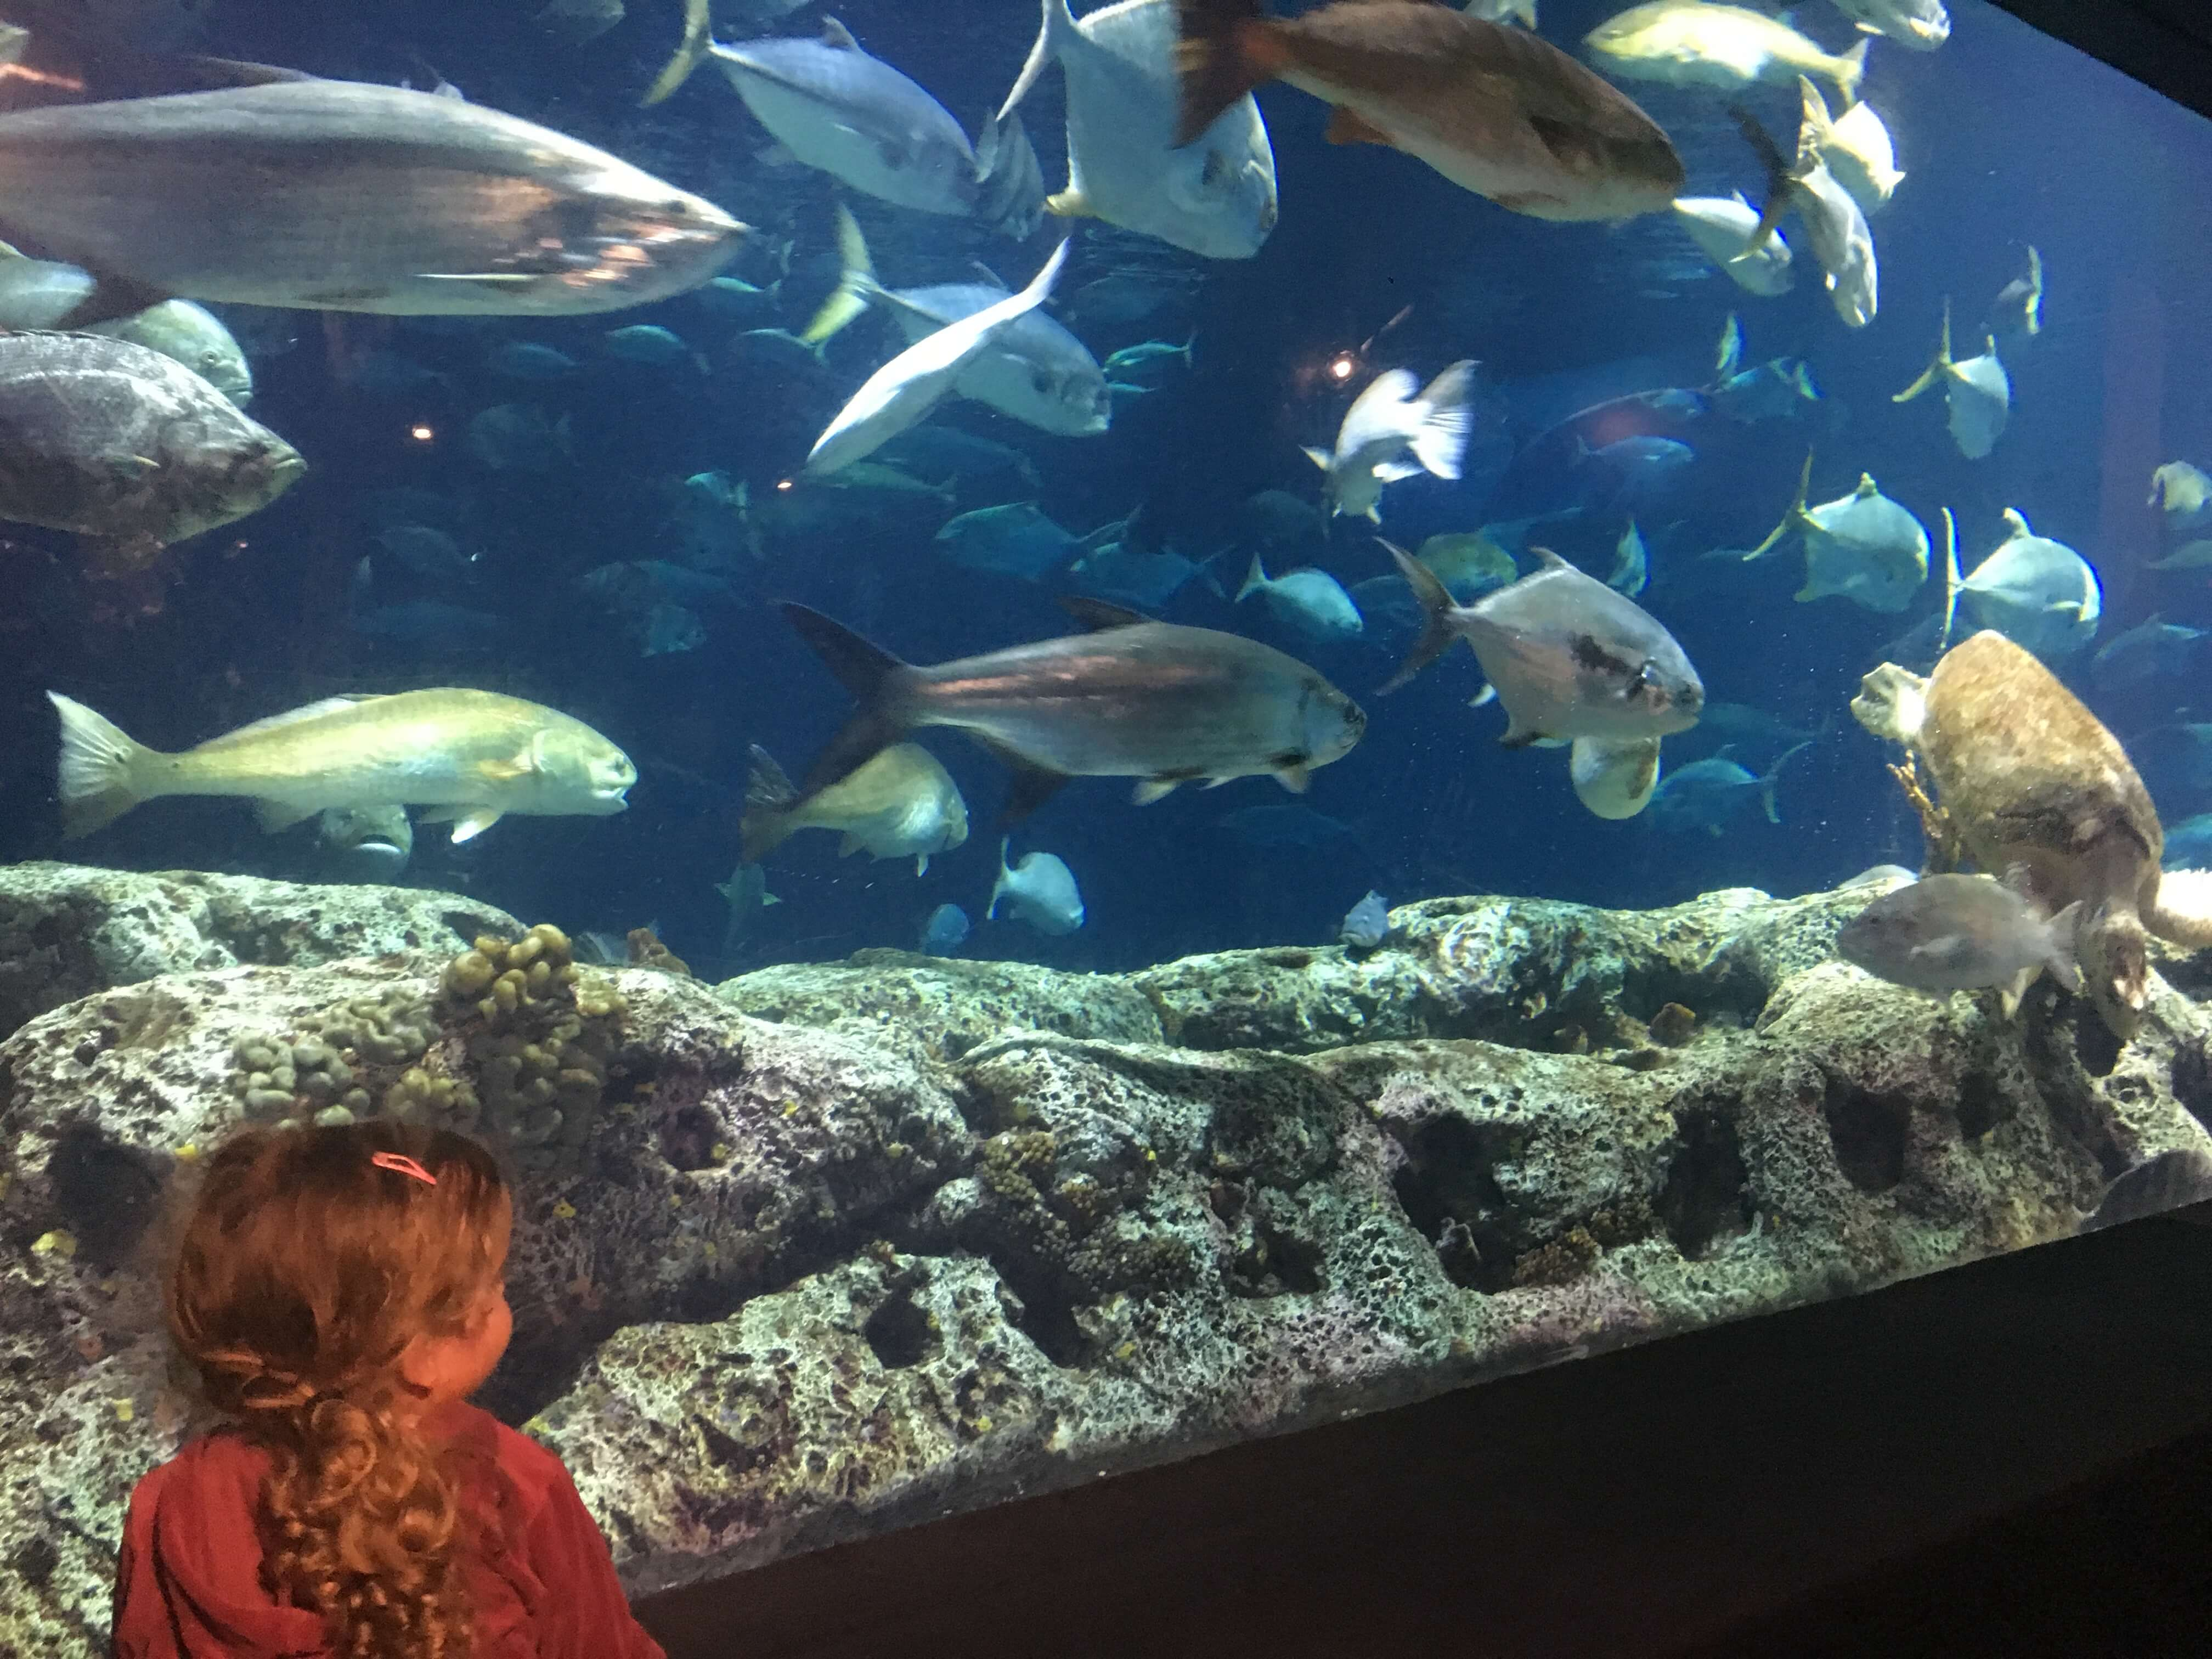 South Carolina Aquarium looking at fish